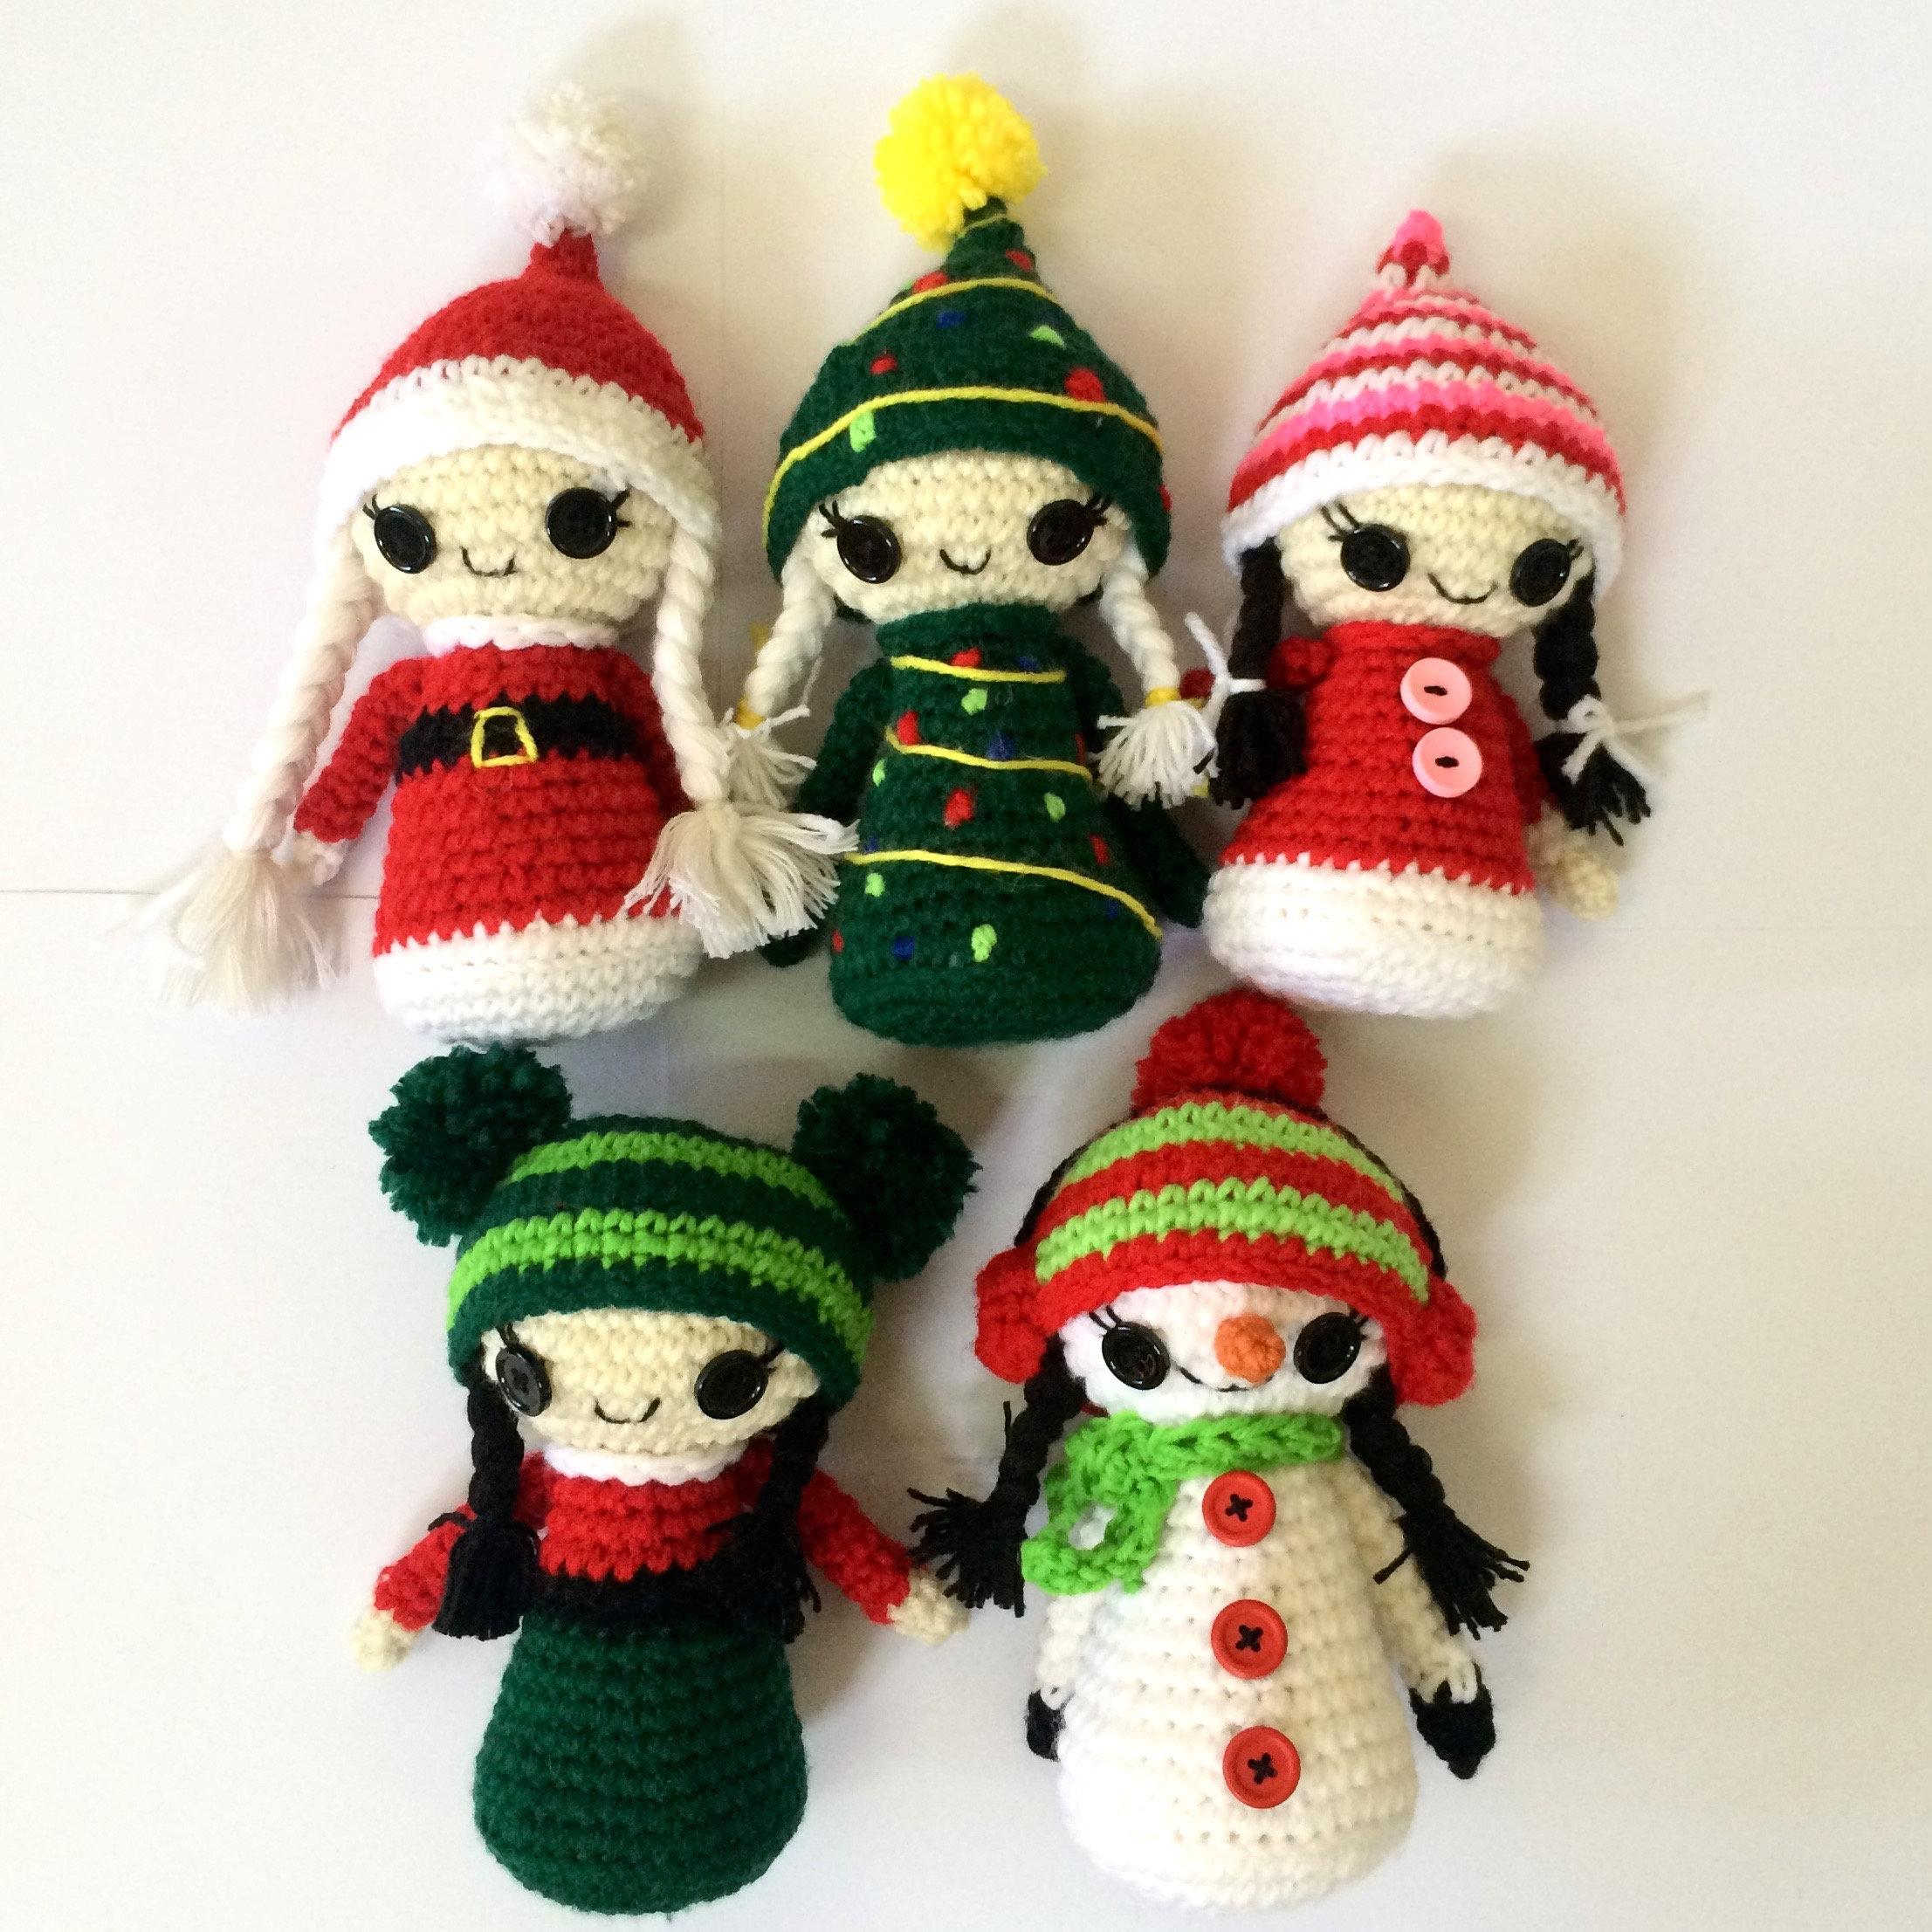 Christmas Gnome - free crochet pattern by Liesbeth Braam ...   2213x2213